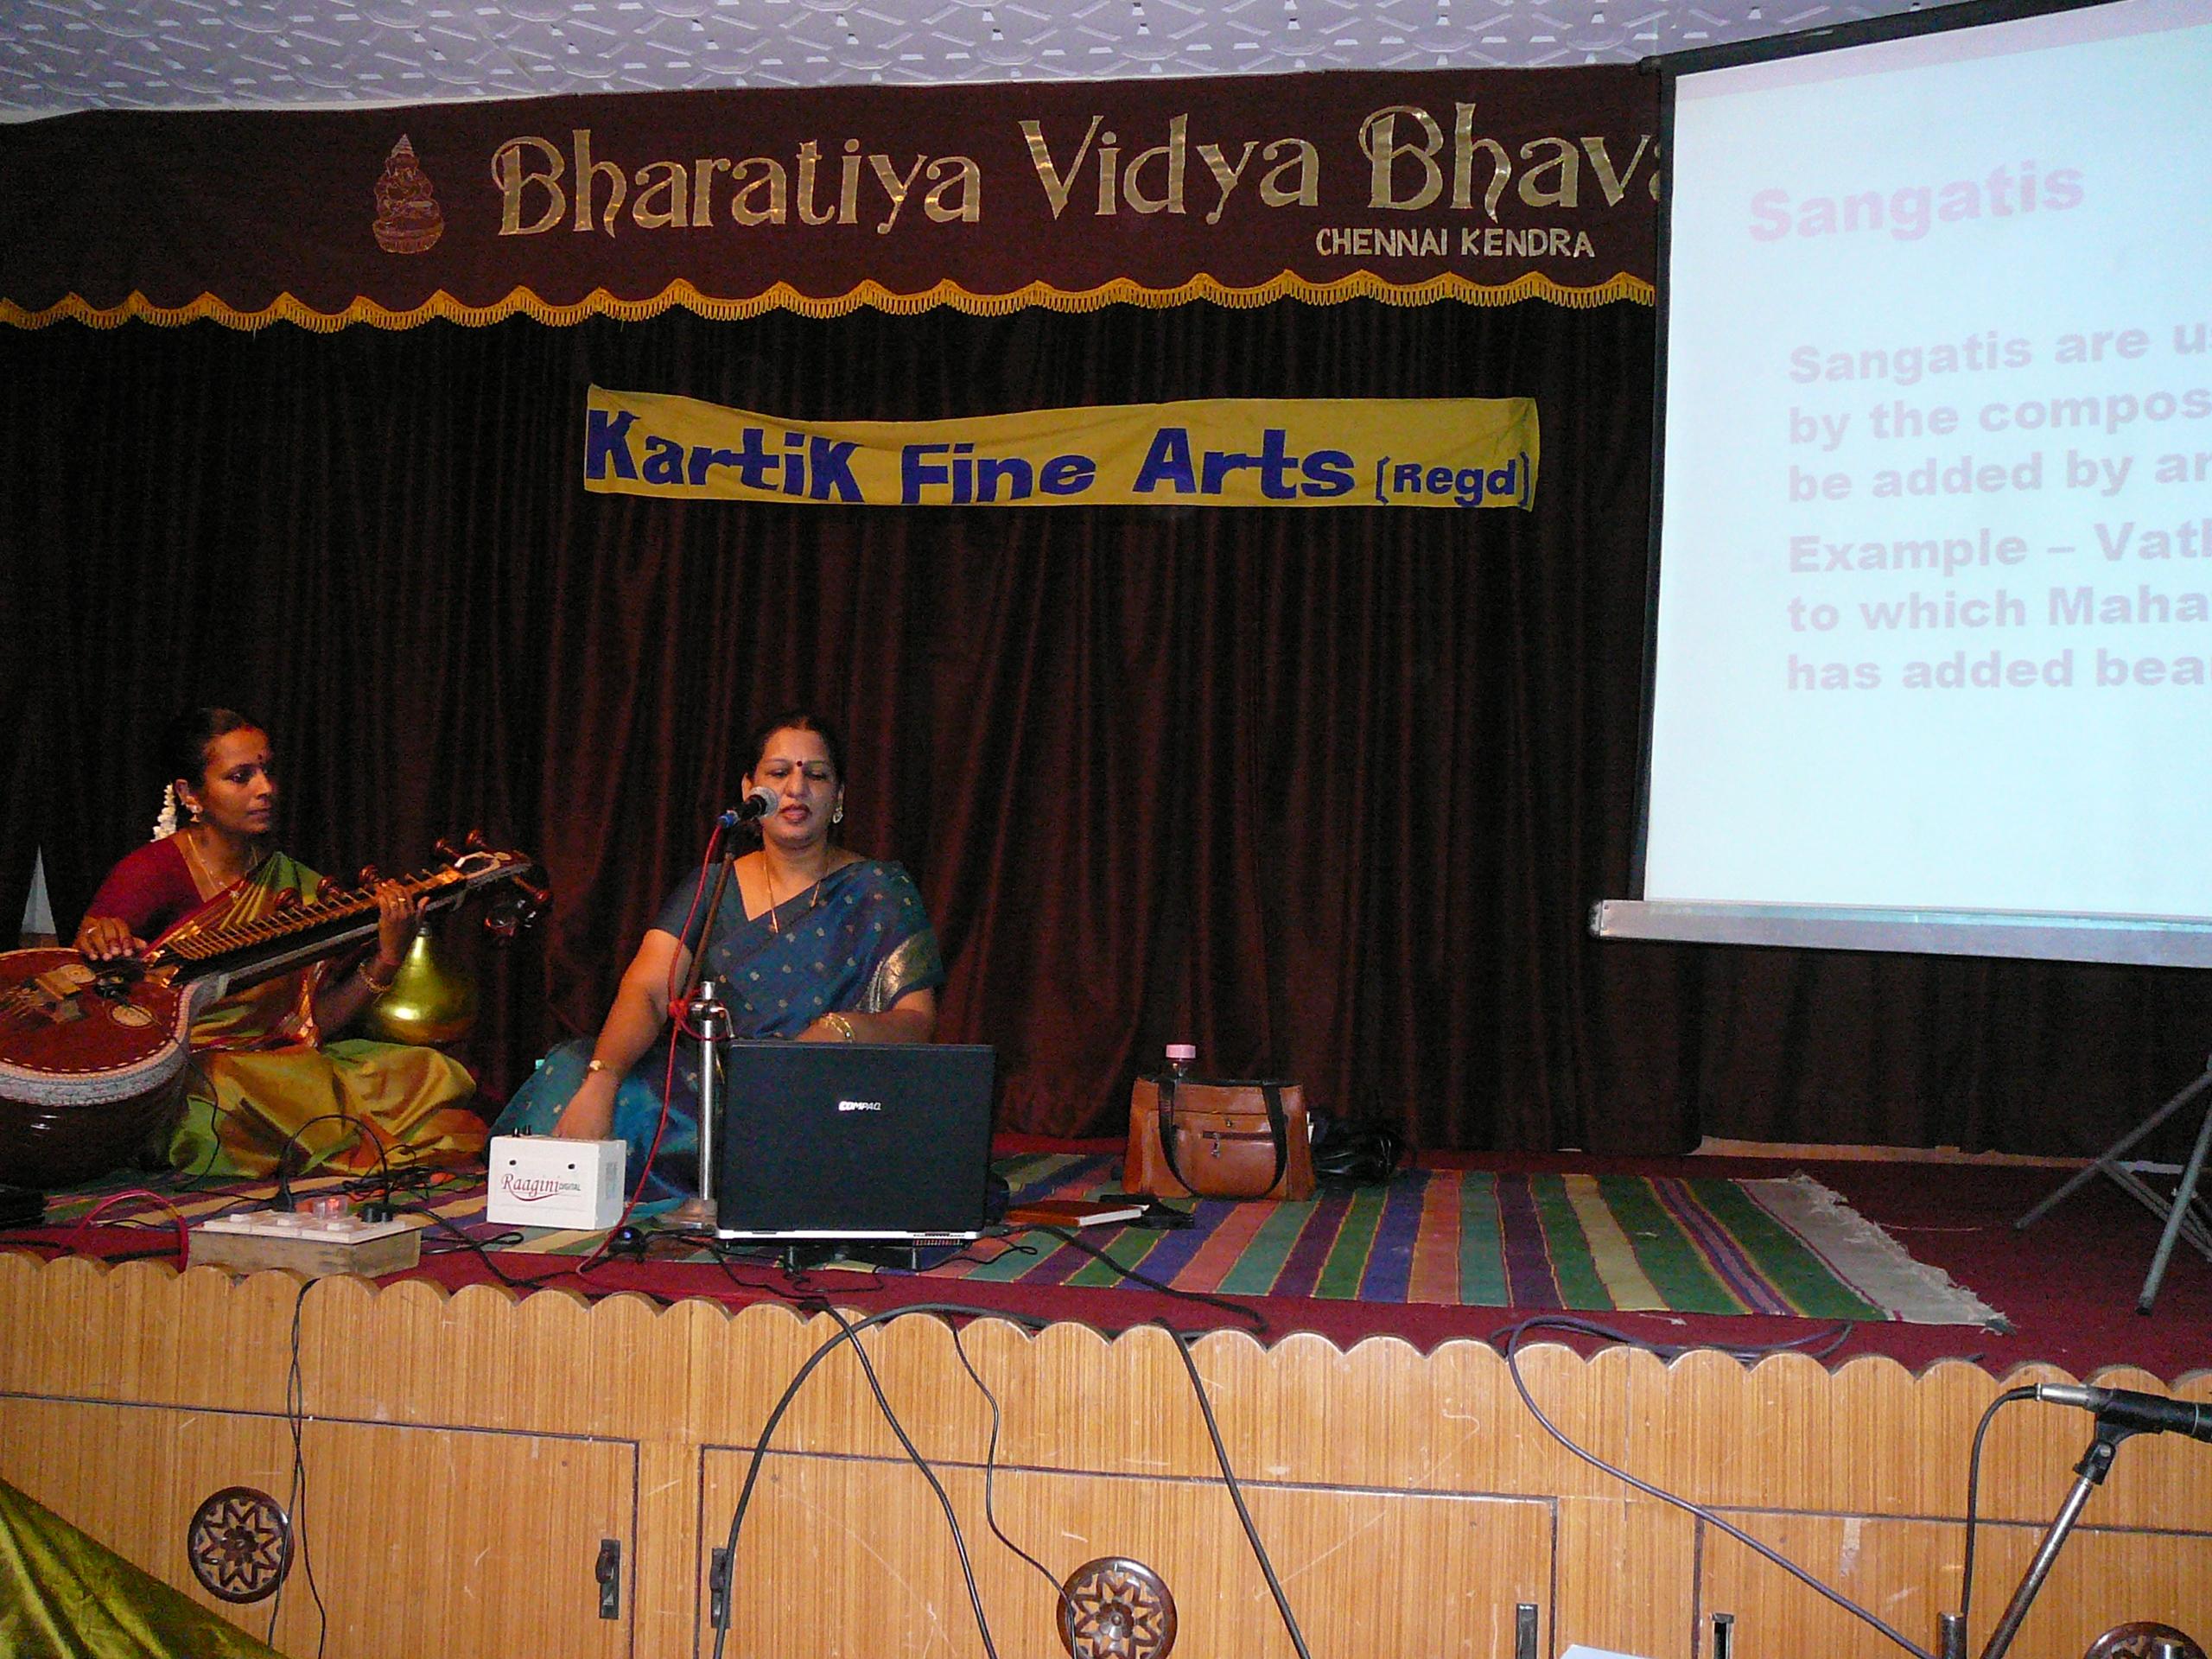 Bharathiya-vidya-bhawan-karthik-fine-arts-classical-music-Singers-Carnatic-Classical